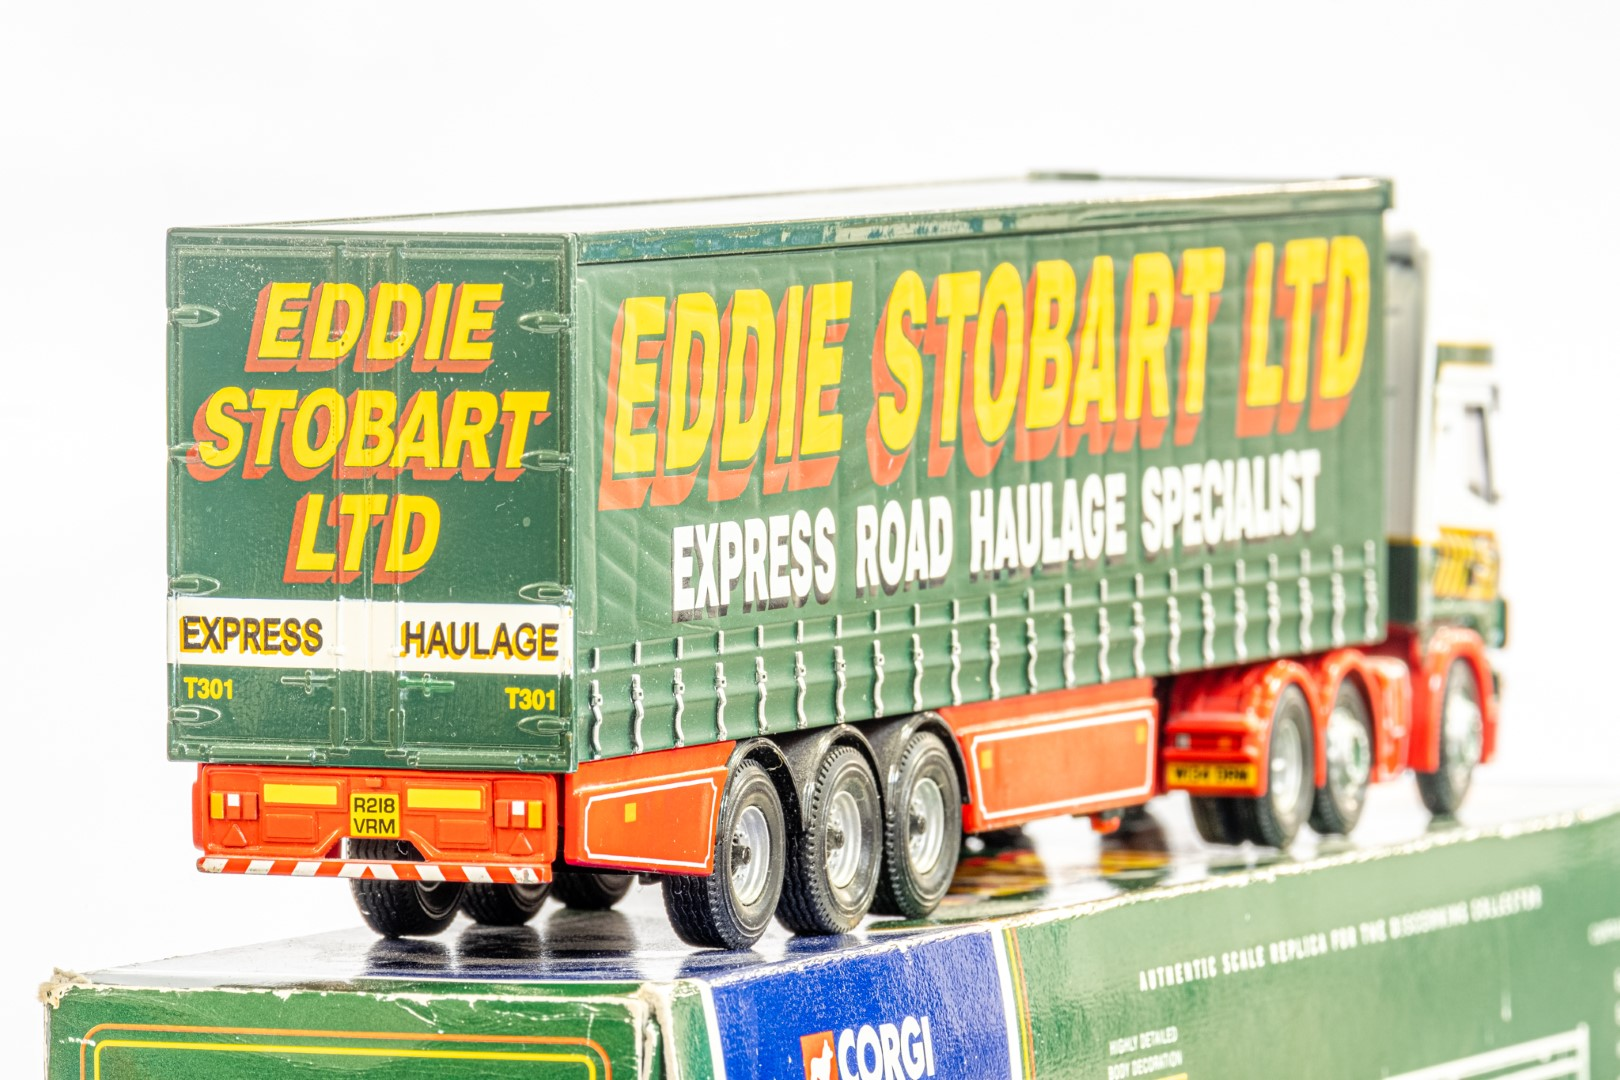 Corgi Scania Topline Curtainside Trailer - Eddie Stobart - Image 6 of 7